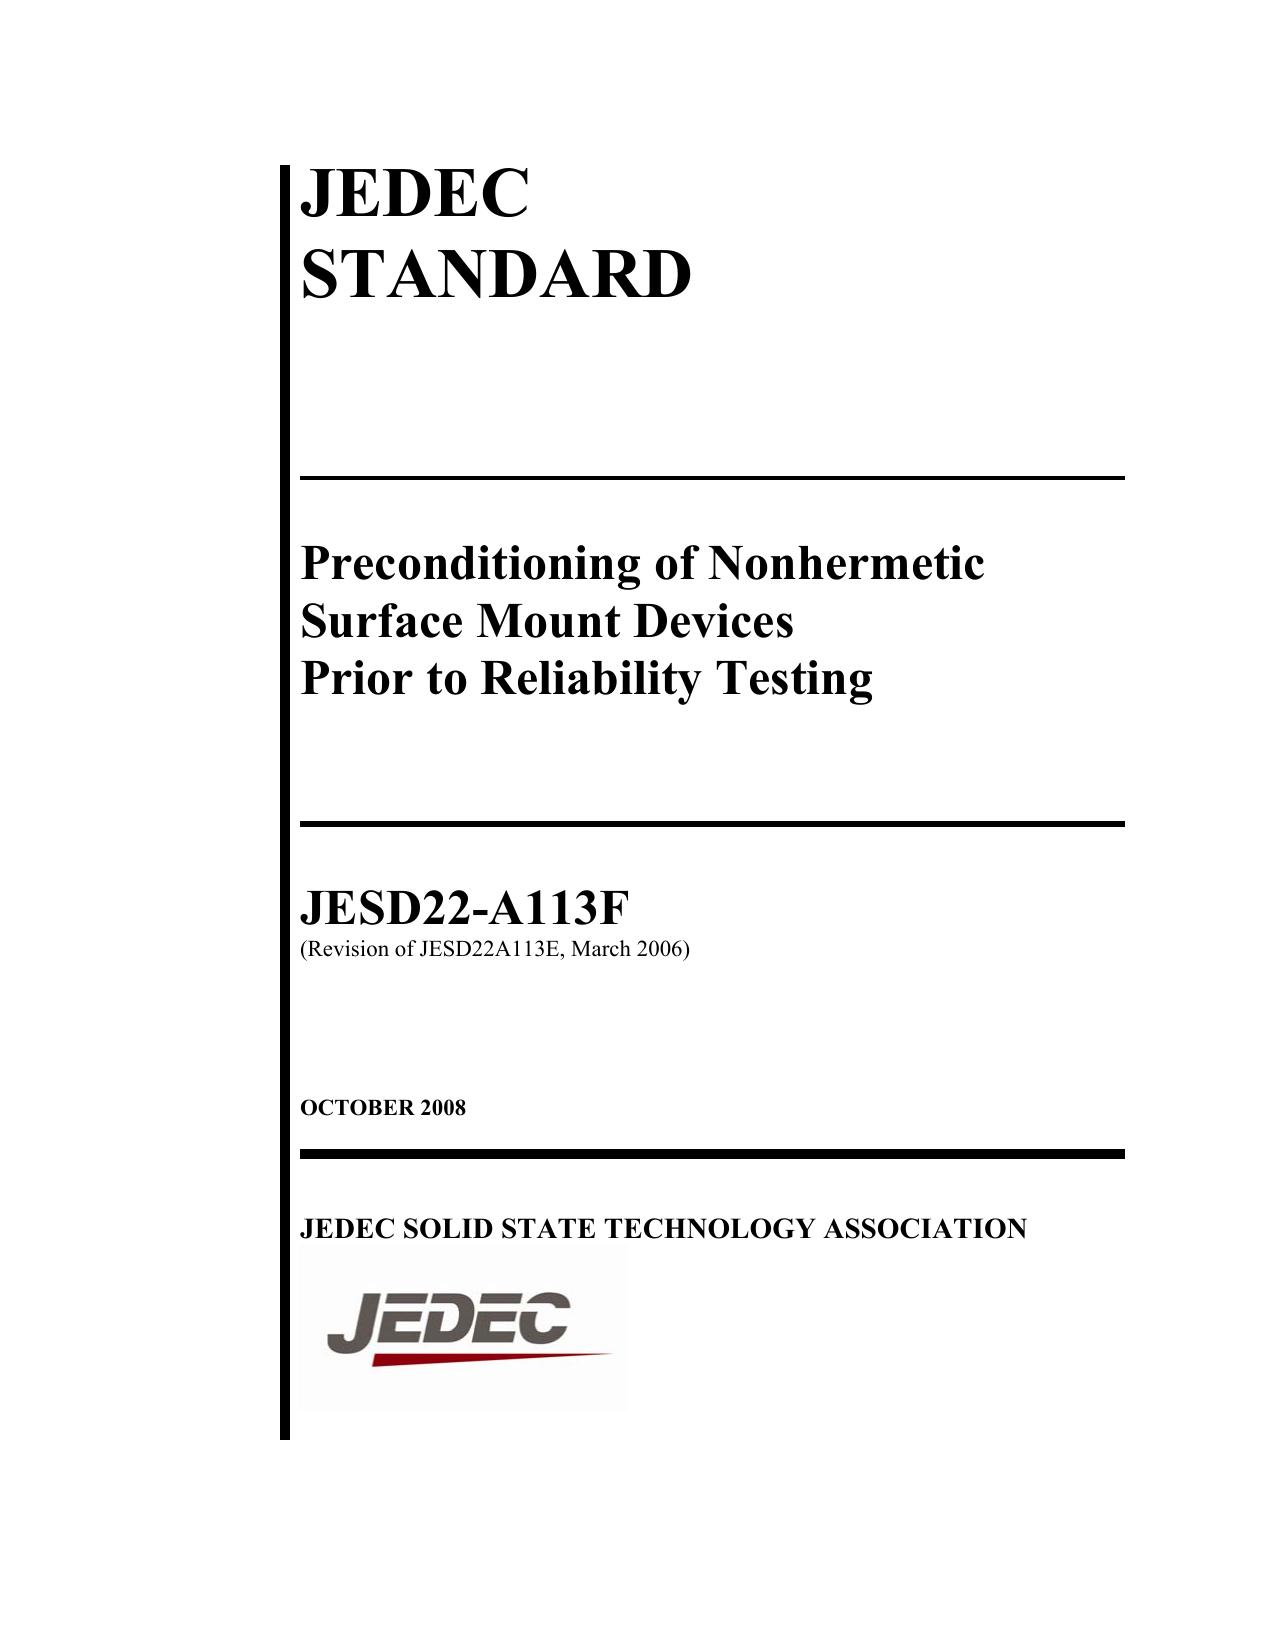 JEDEC STANDARD